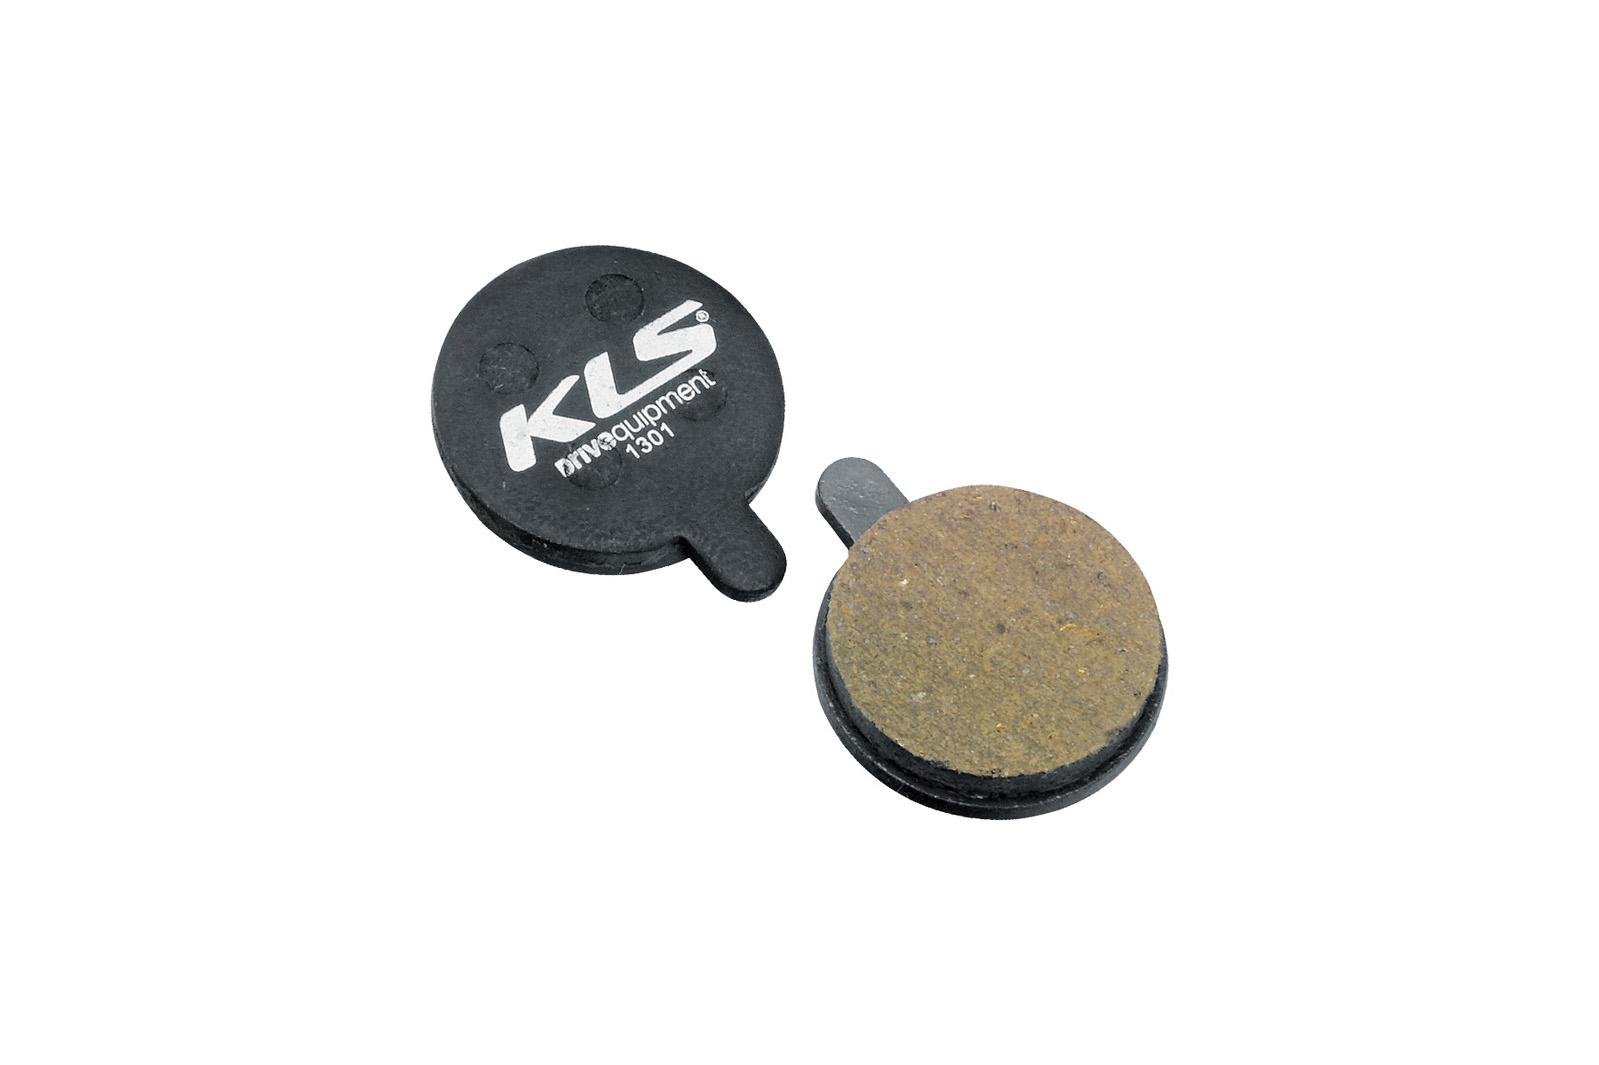 Brzdové destičky KLS D-13, organické